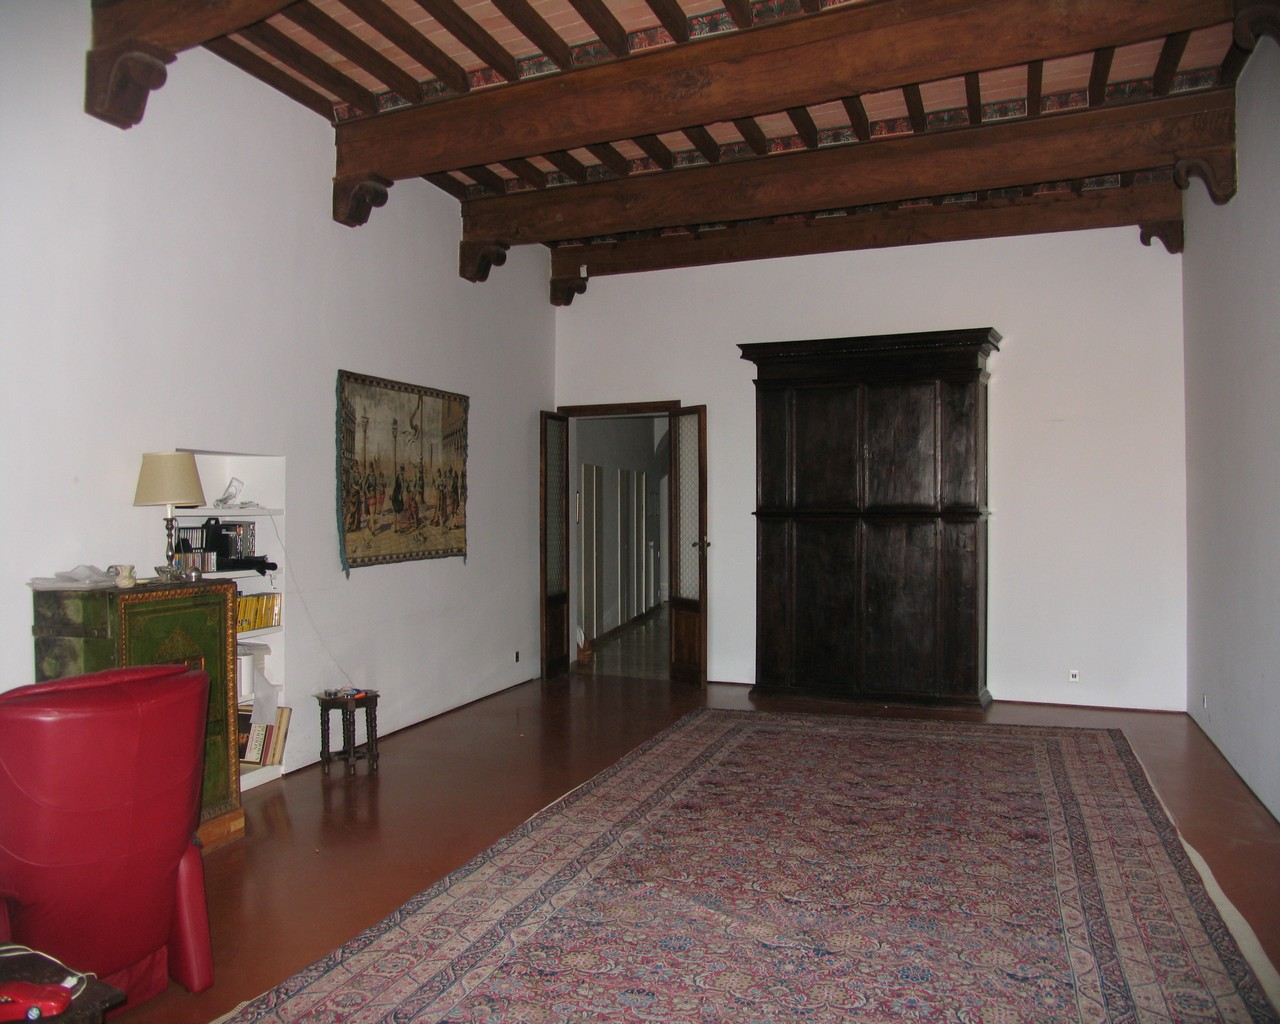 Siena appartamento Centro storico con giardino garage e limonaia